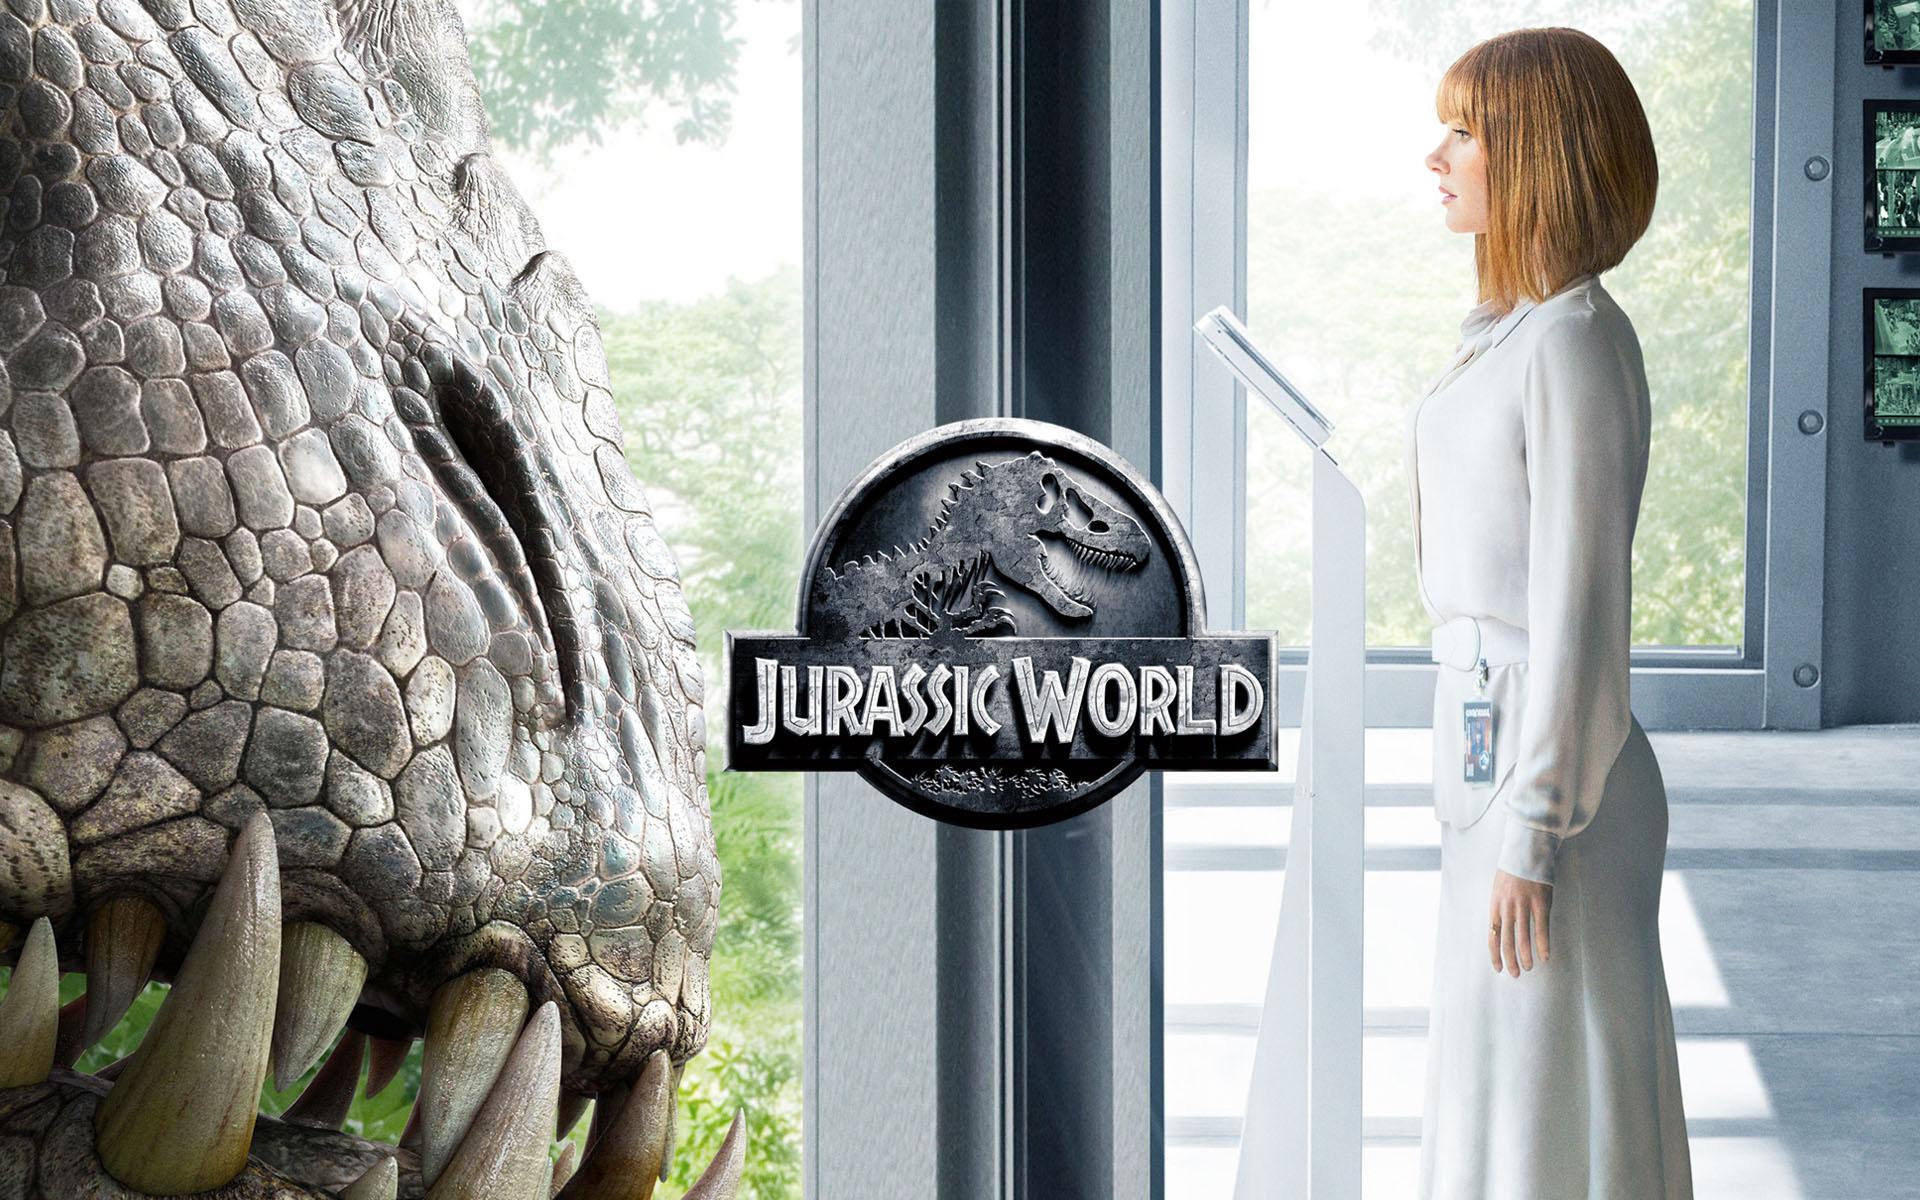 Real Jurassic World?